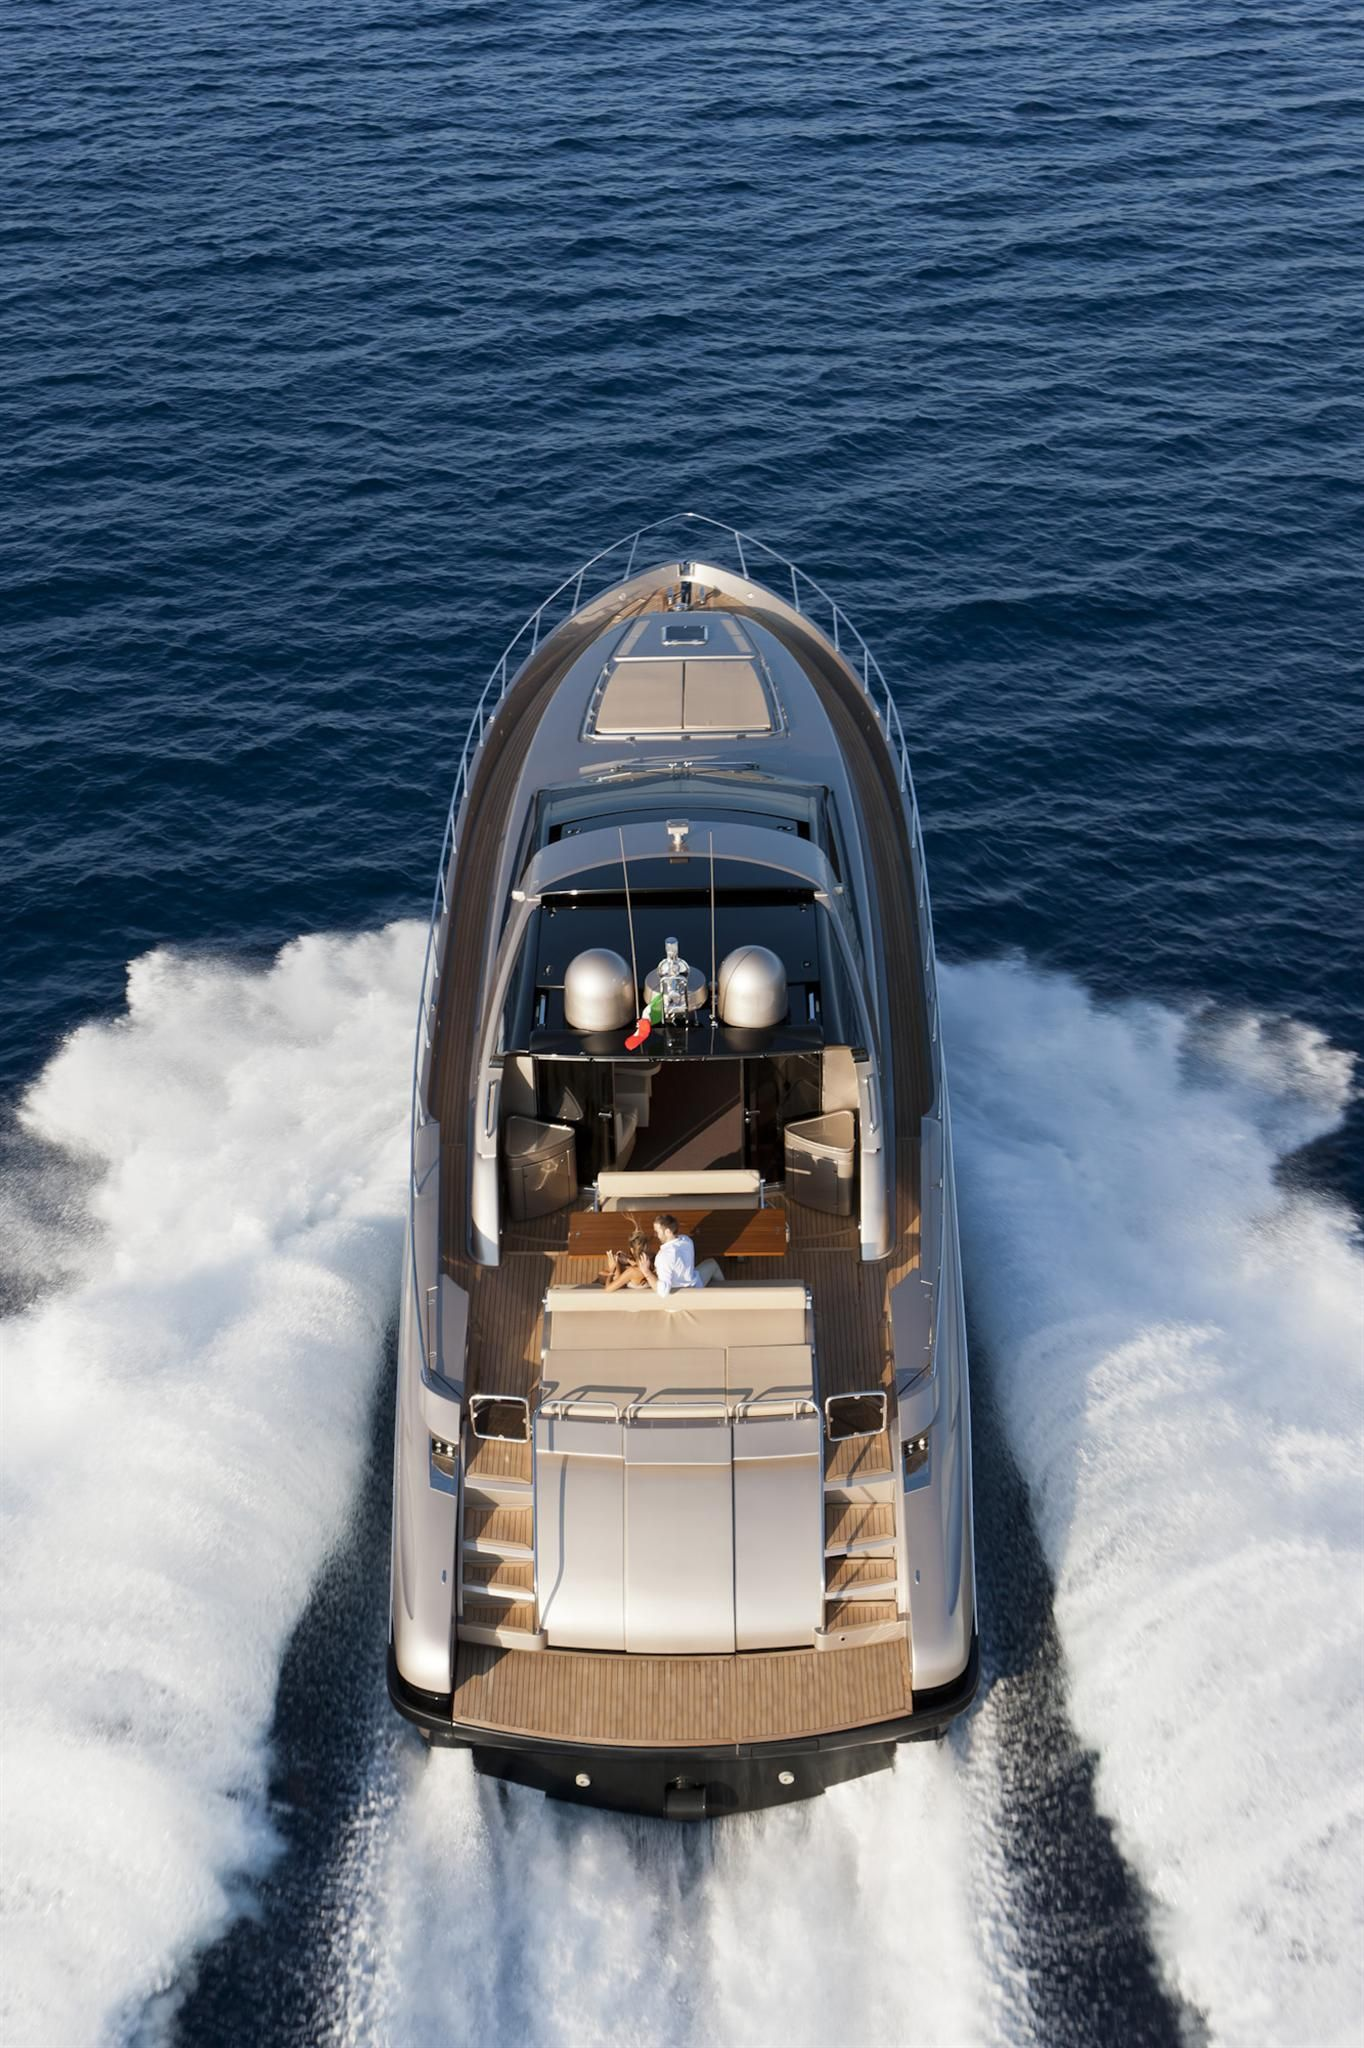 External view Riva Yacht - 68' Ego Super #yacht #luxury #ferretti #riva